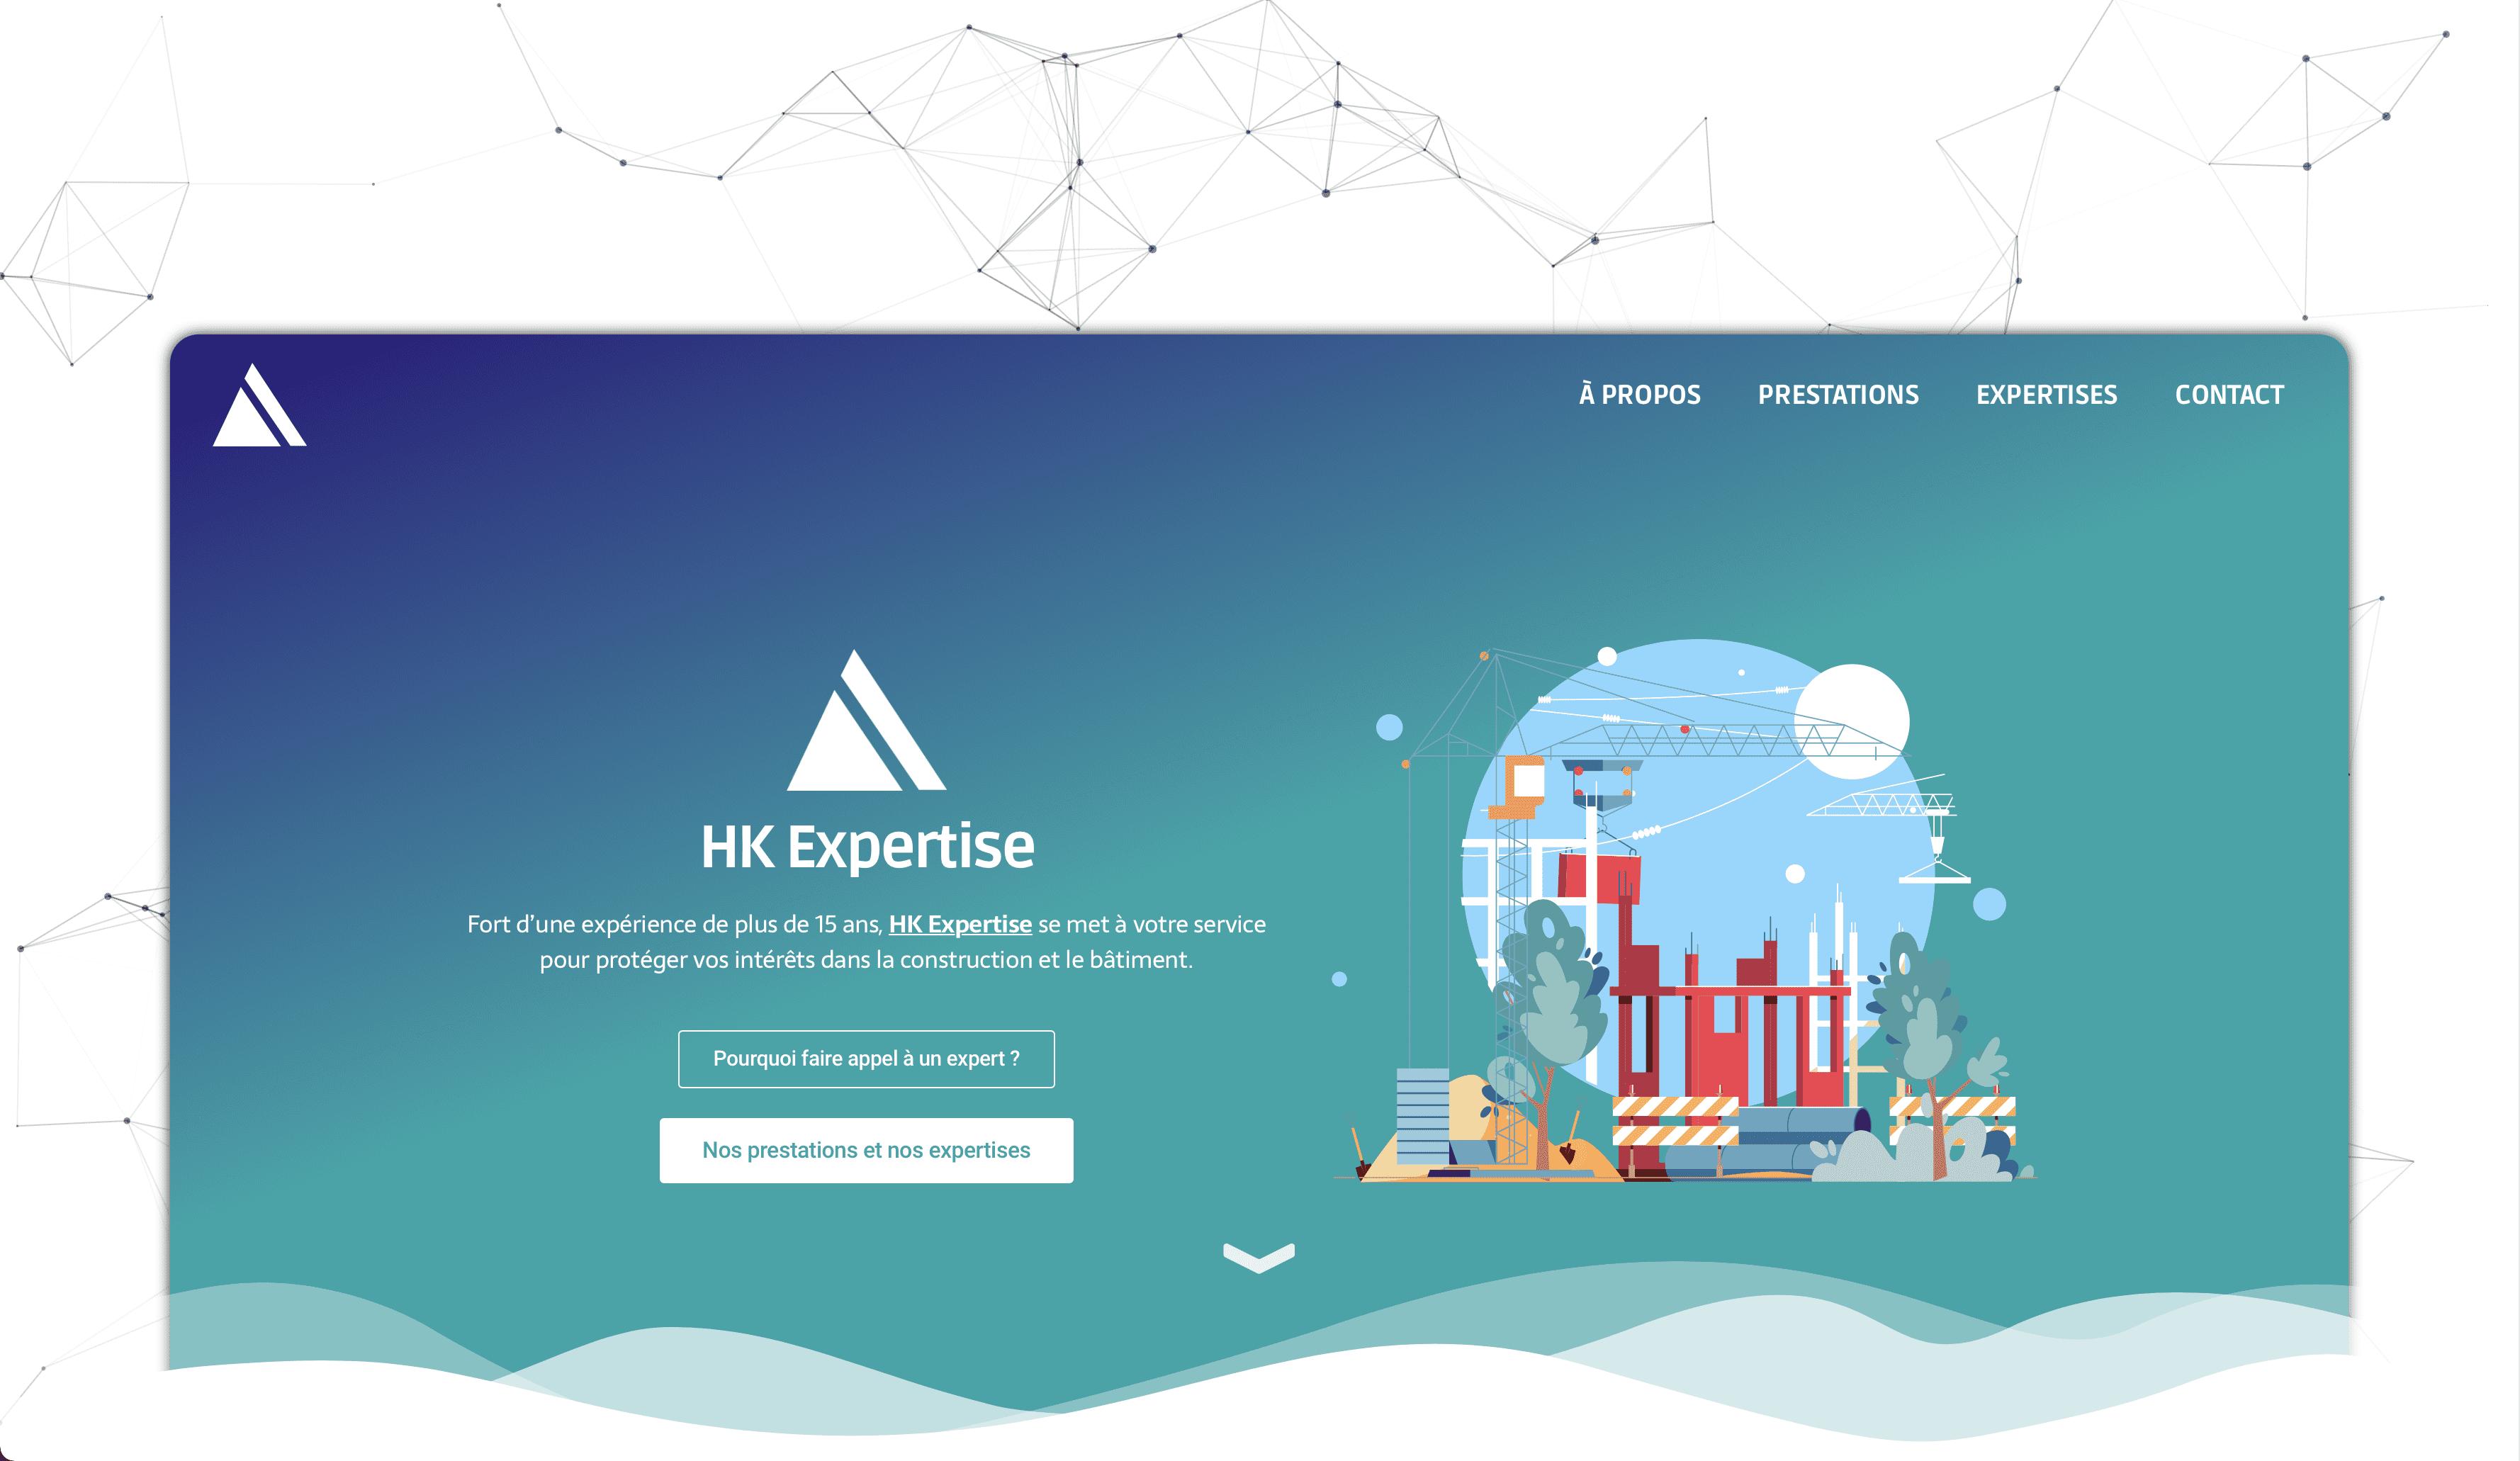 HK Expertise Agence Artwork Votre Agence de Communication Digitale